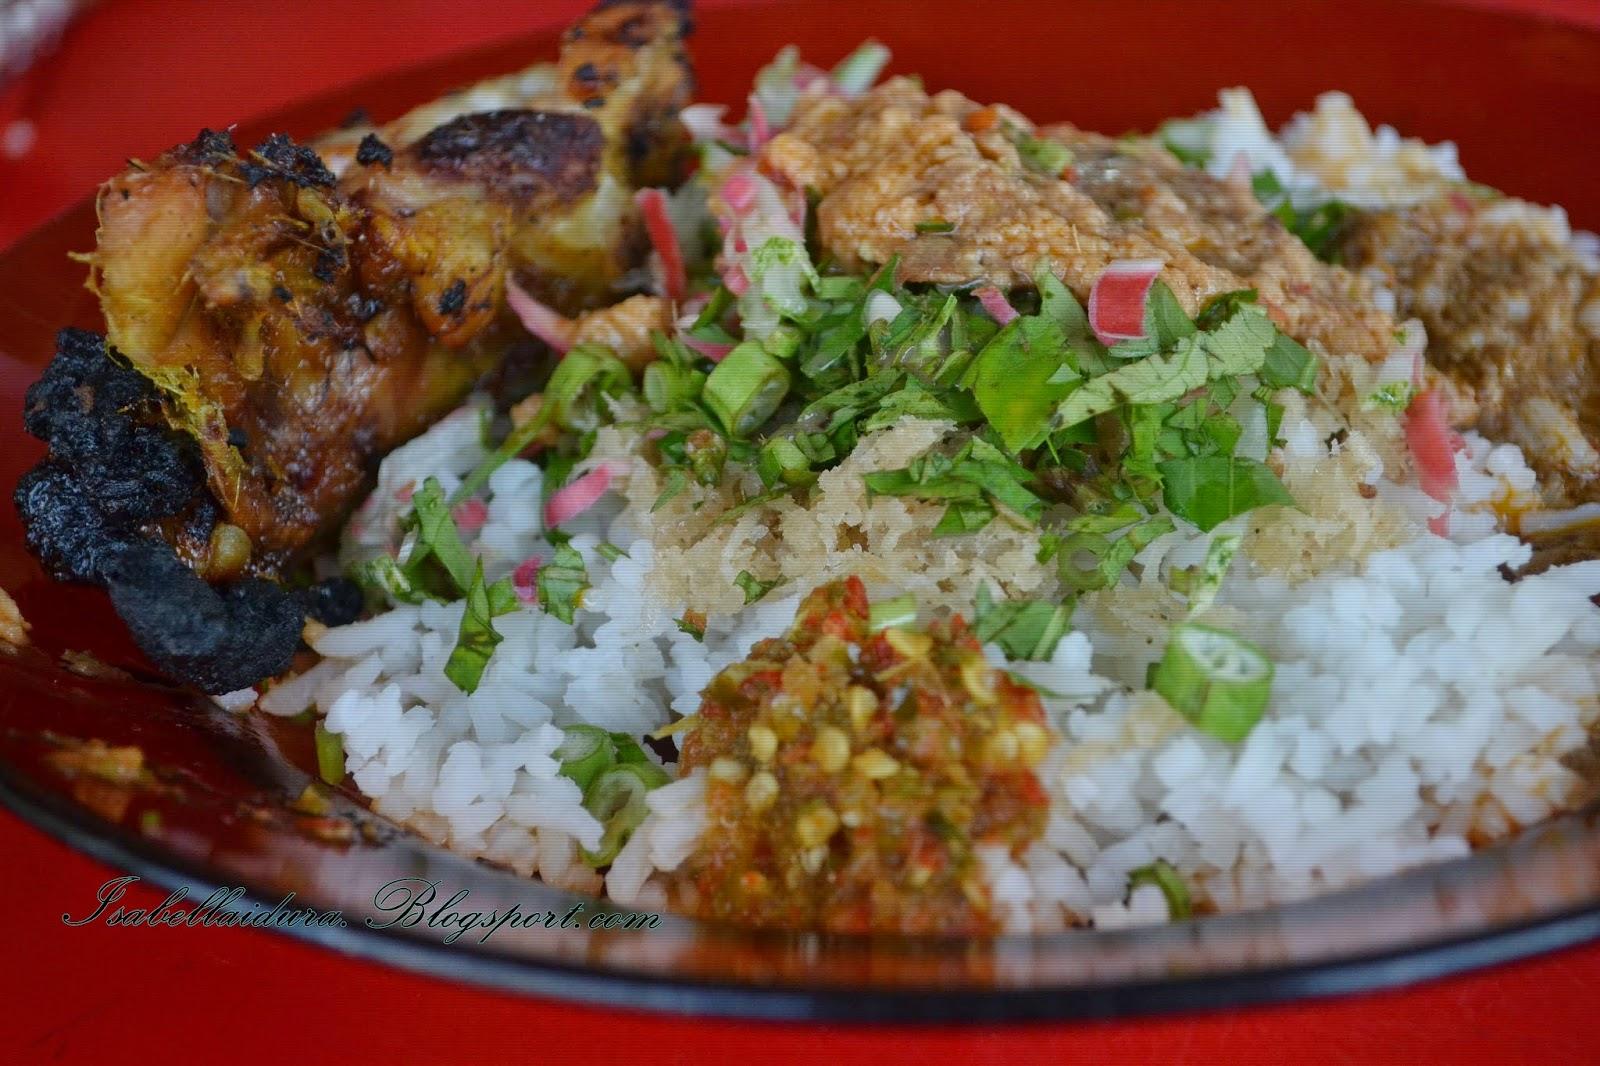 nasi, kerabu, ayam bakar